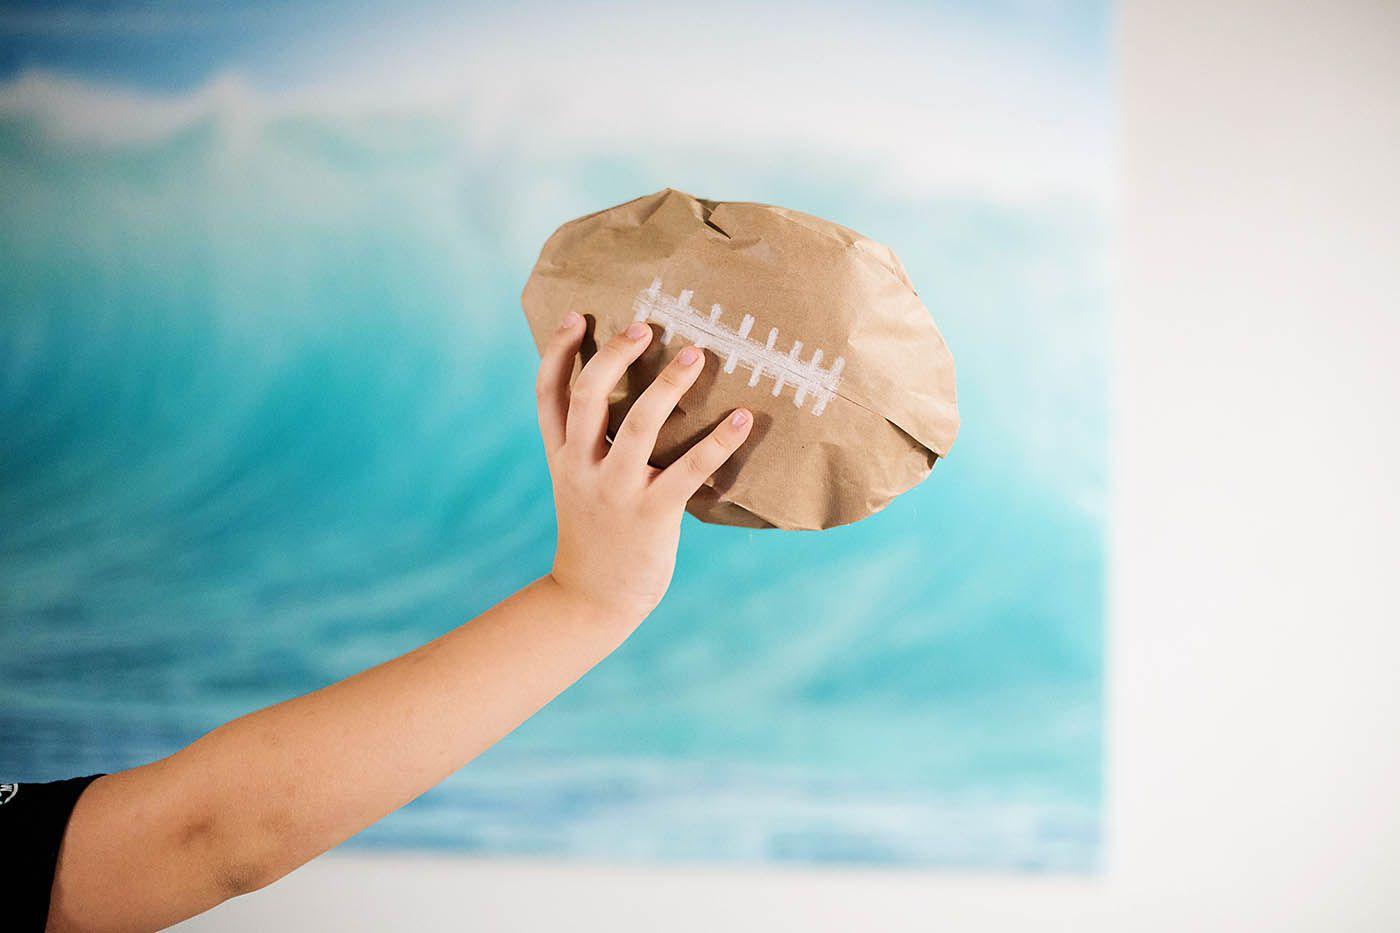 diy paper football